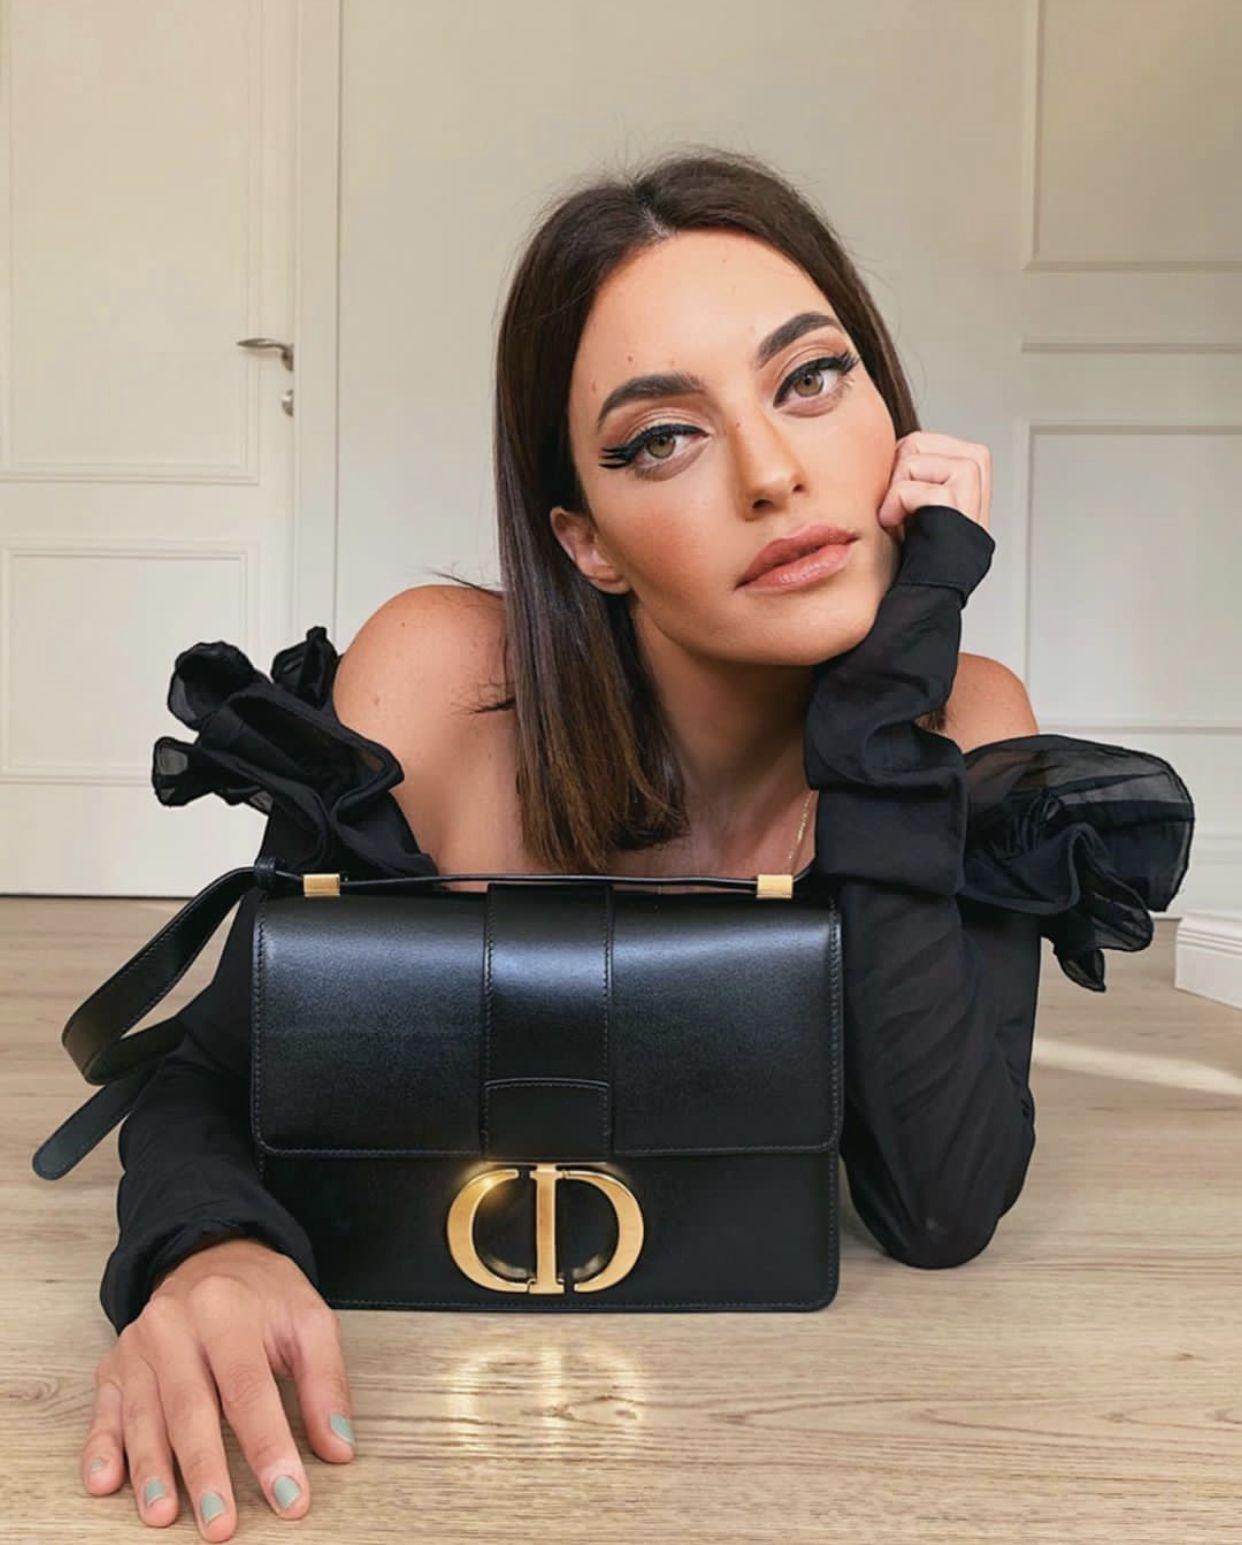 aad75468 30 Montaigne calfskin bag   The Dior 30 Montaigne bag in 2019   Dior ...